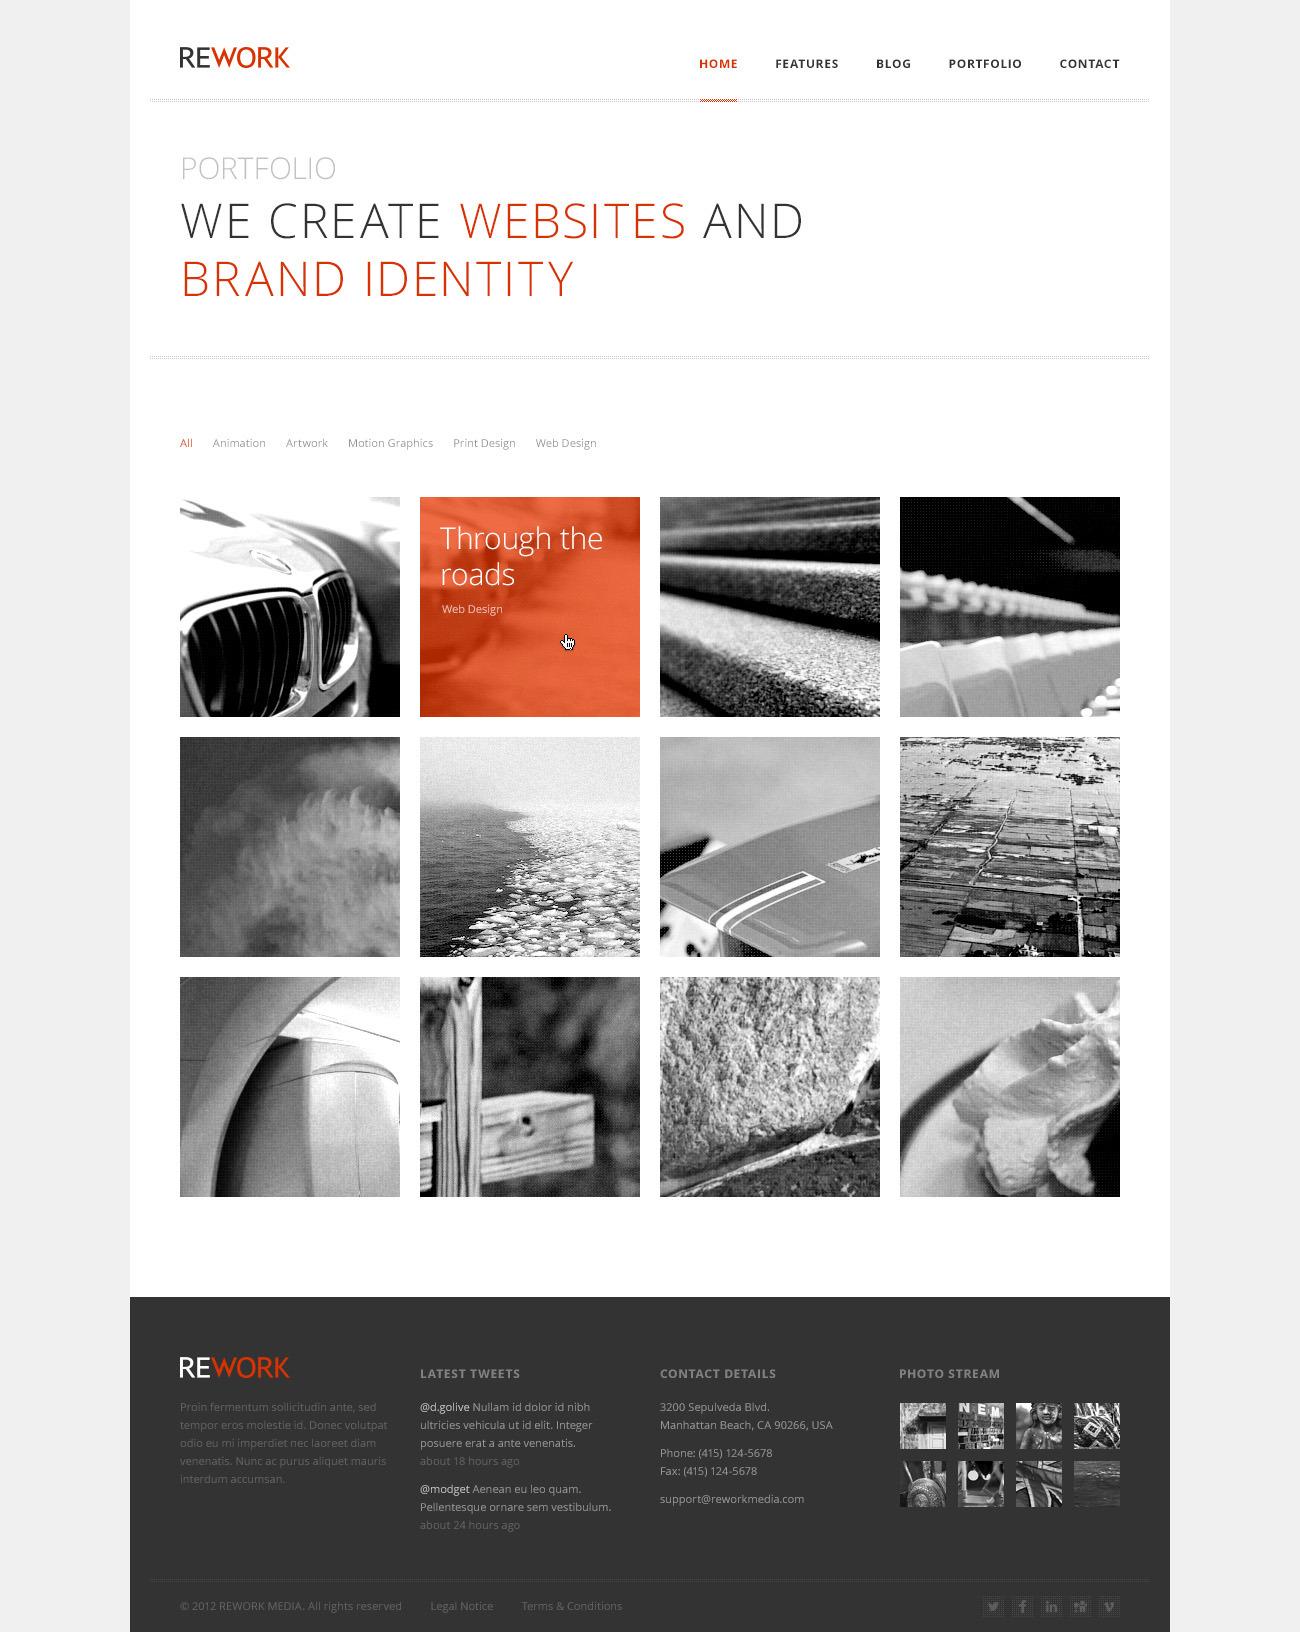 REWORK - Responsive HTML5/CSS3 Template by Mird | ThemeForest